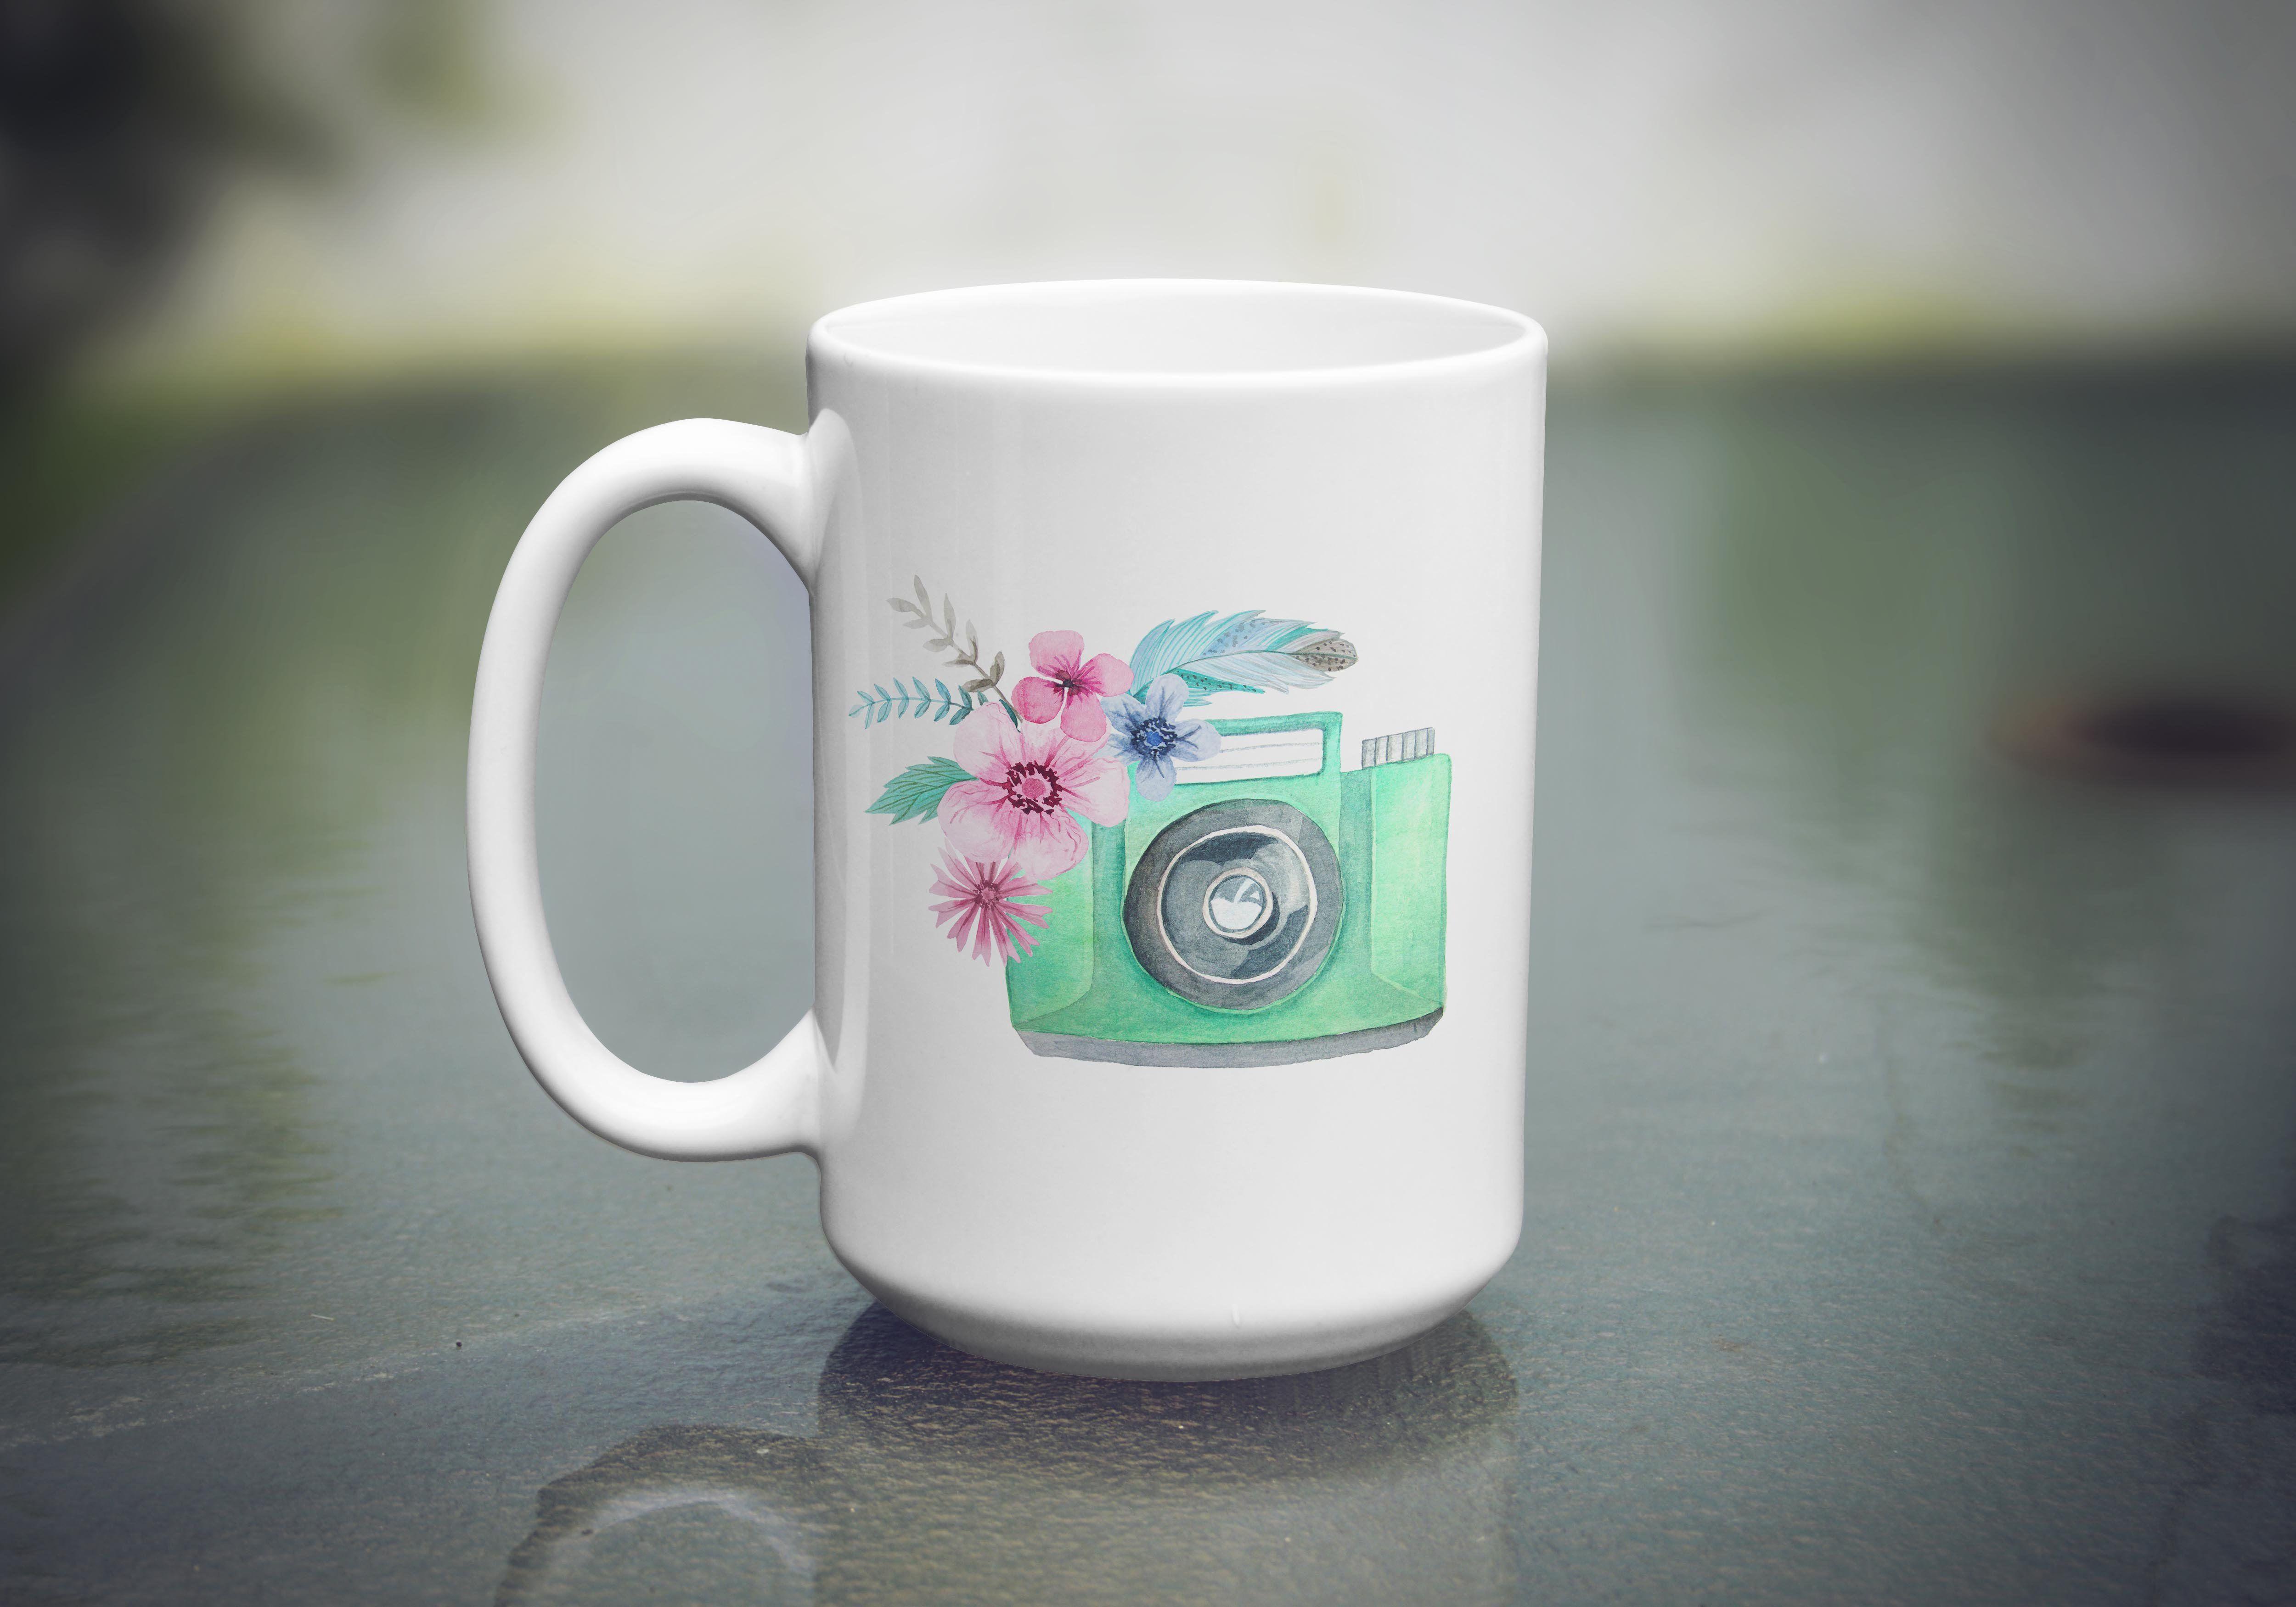 Camera And Flower Watercolor Mug Watercolor Flowers Friends In